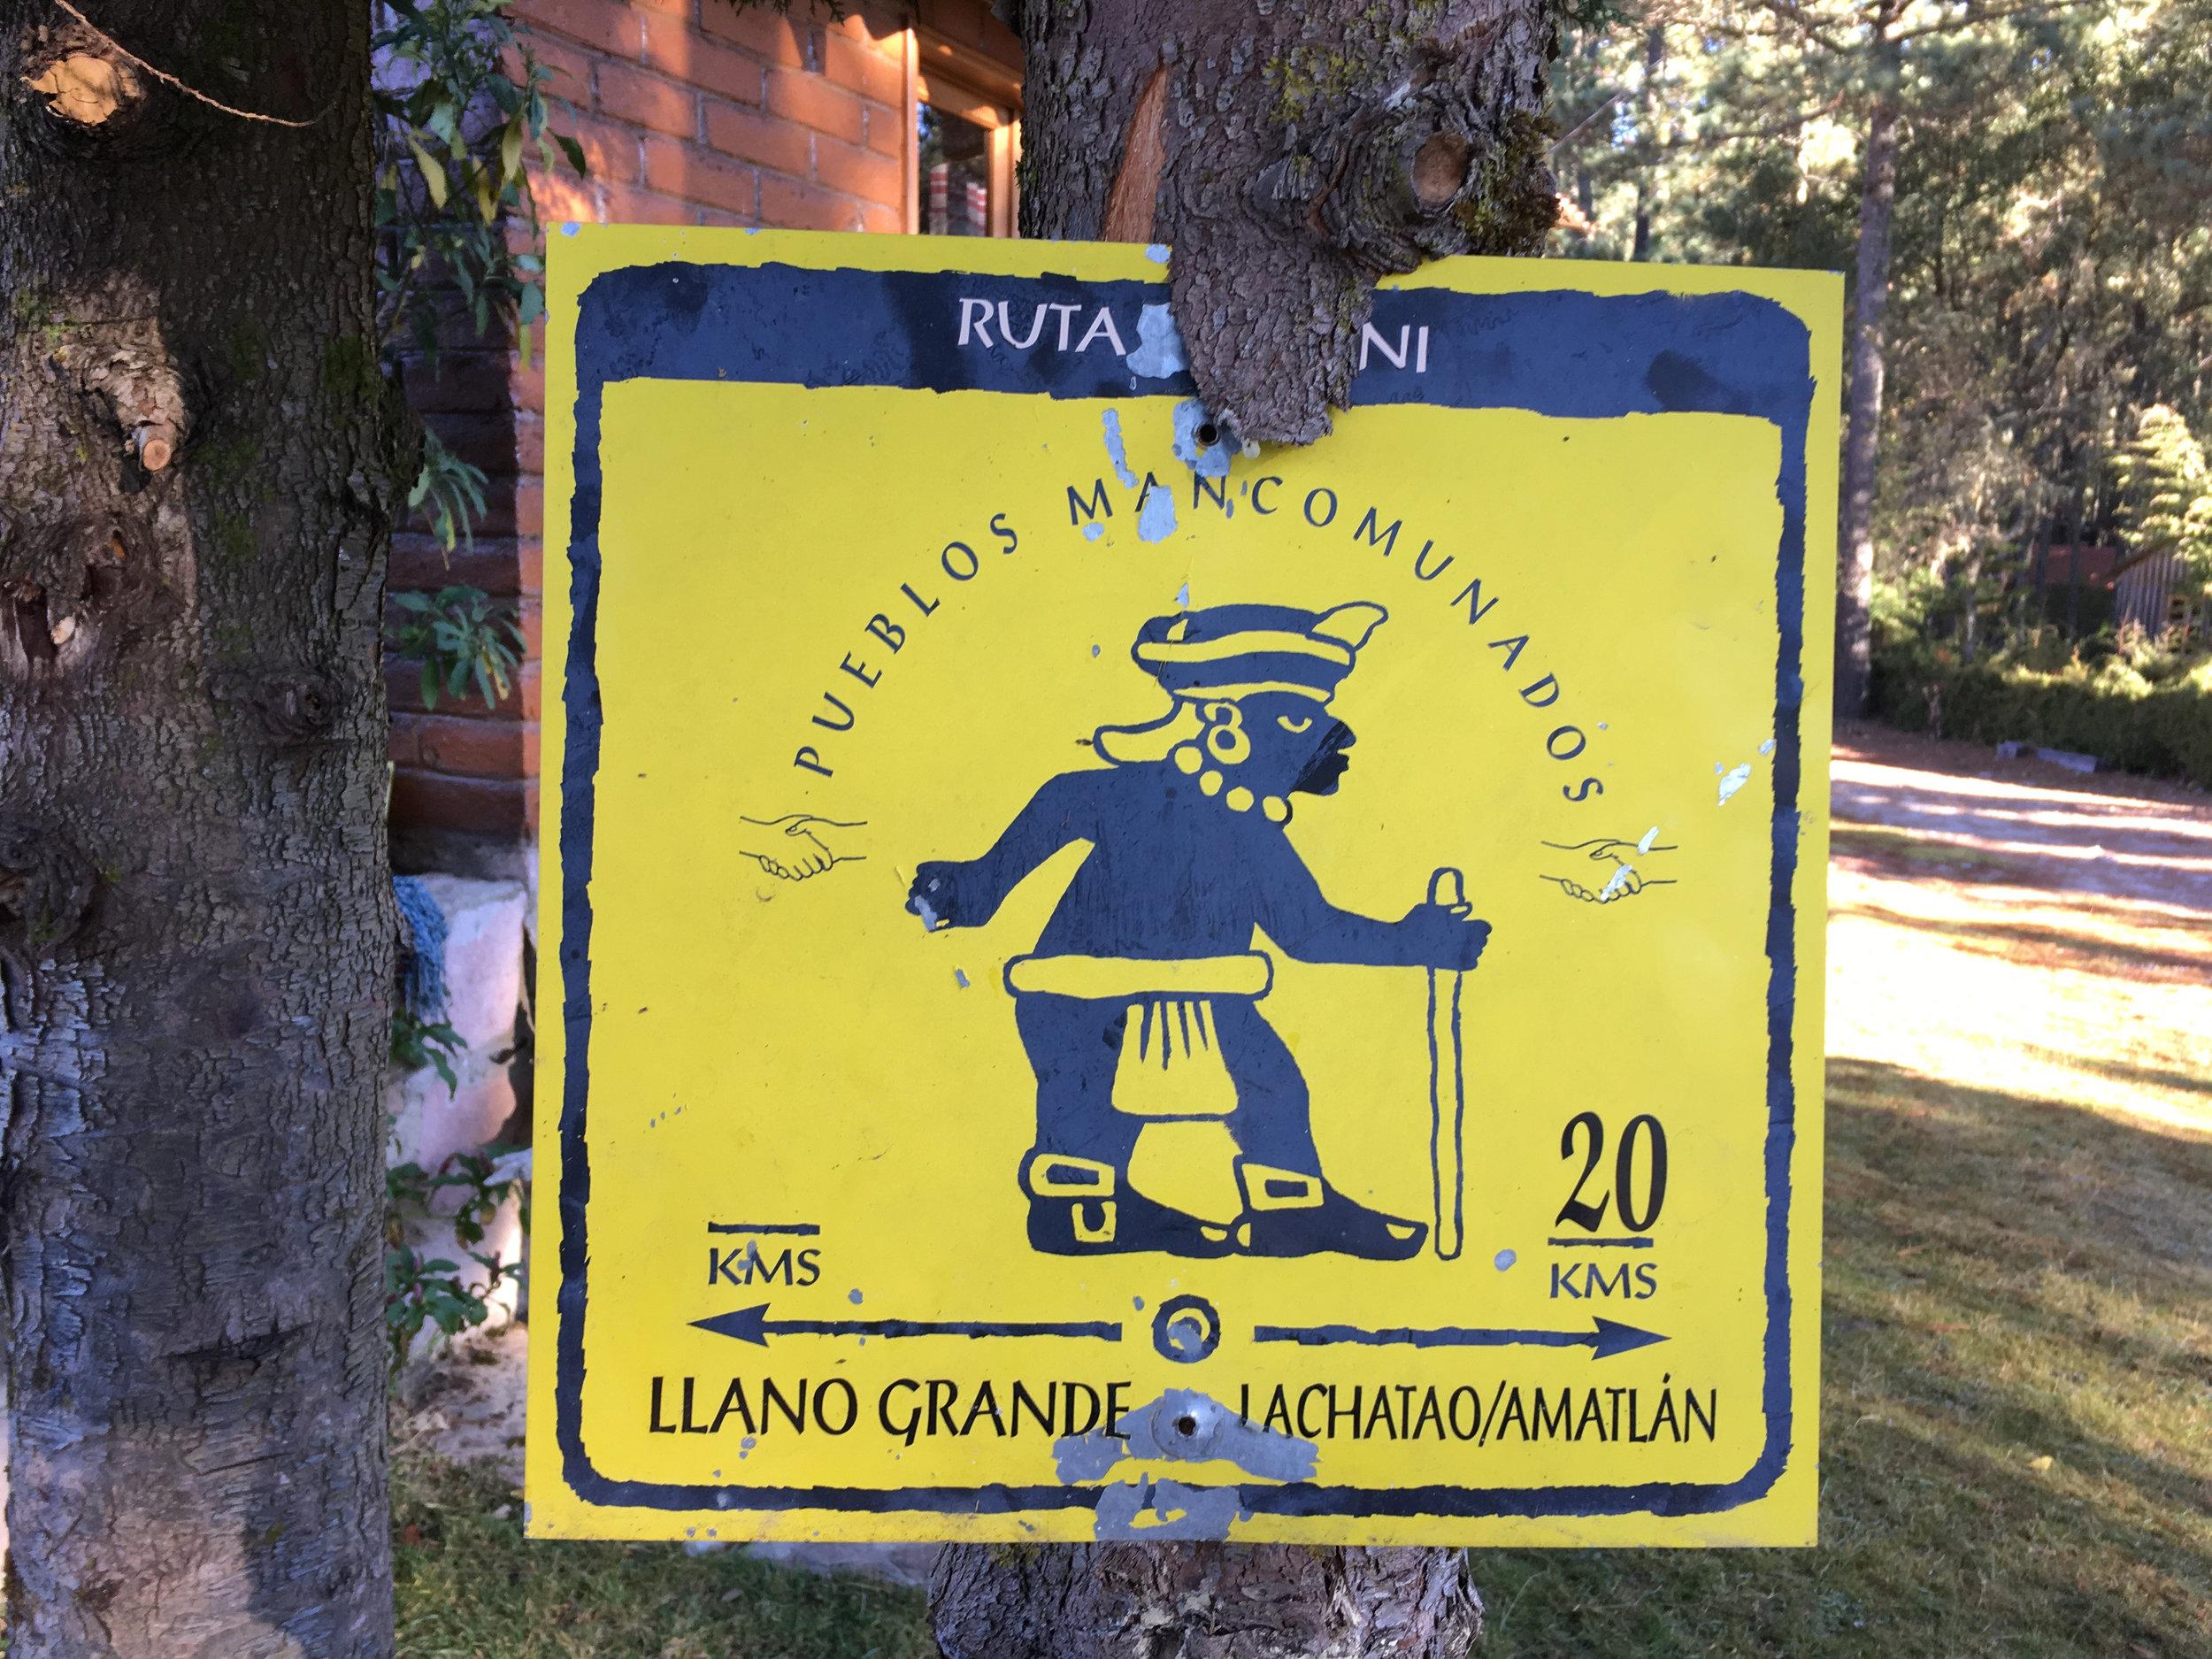 Llano Grande Mountain bike trail sign Oaxaca, Mexico tours